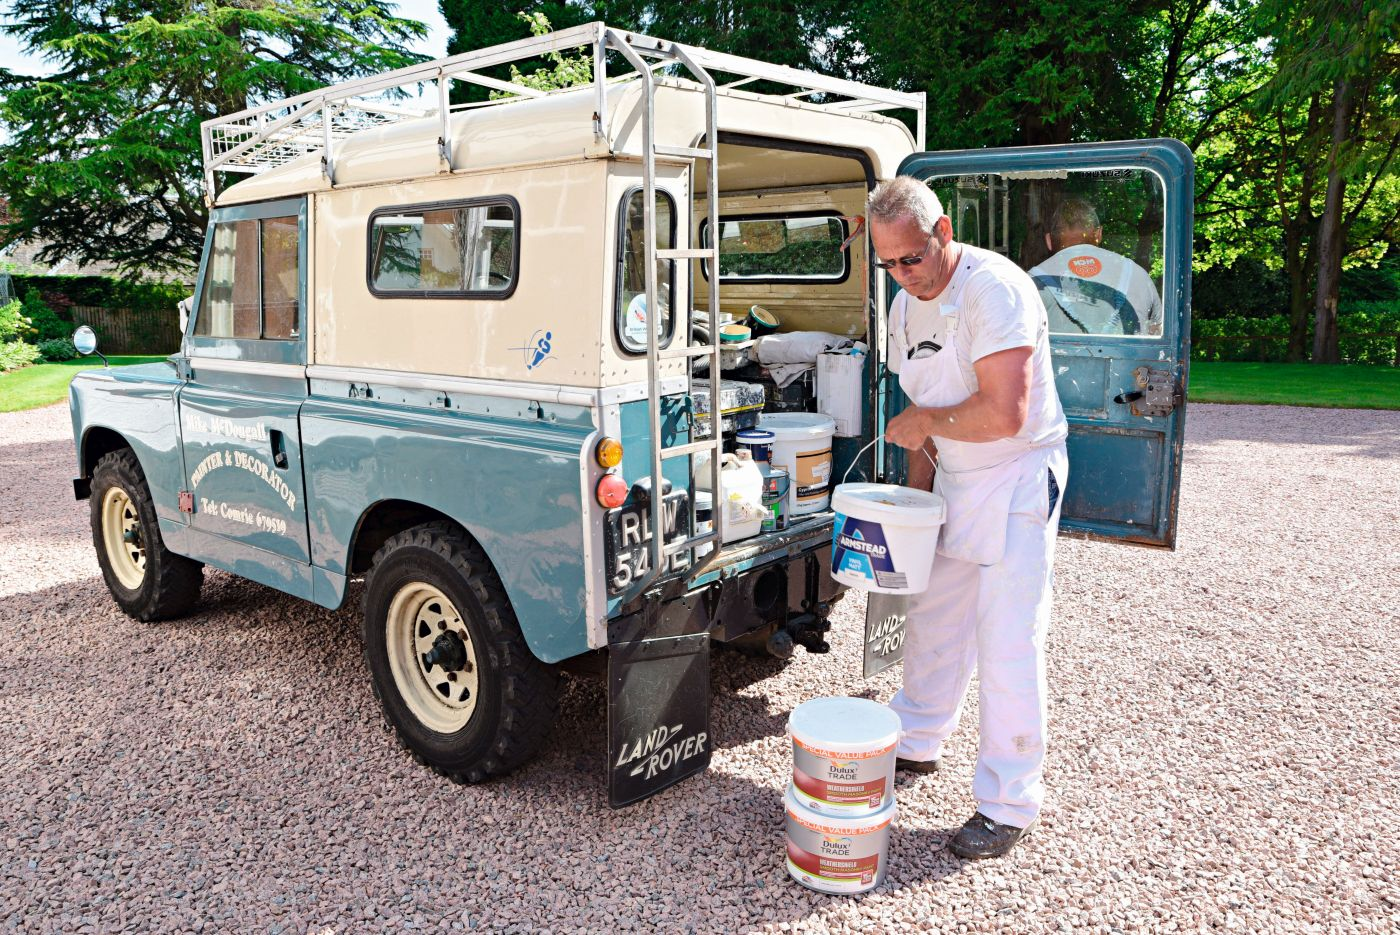 Landy Love 1967 Land Rover 88 (2)